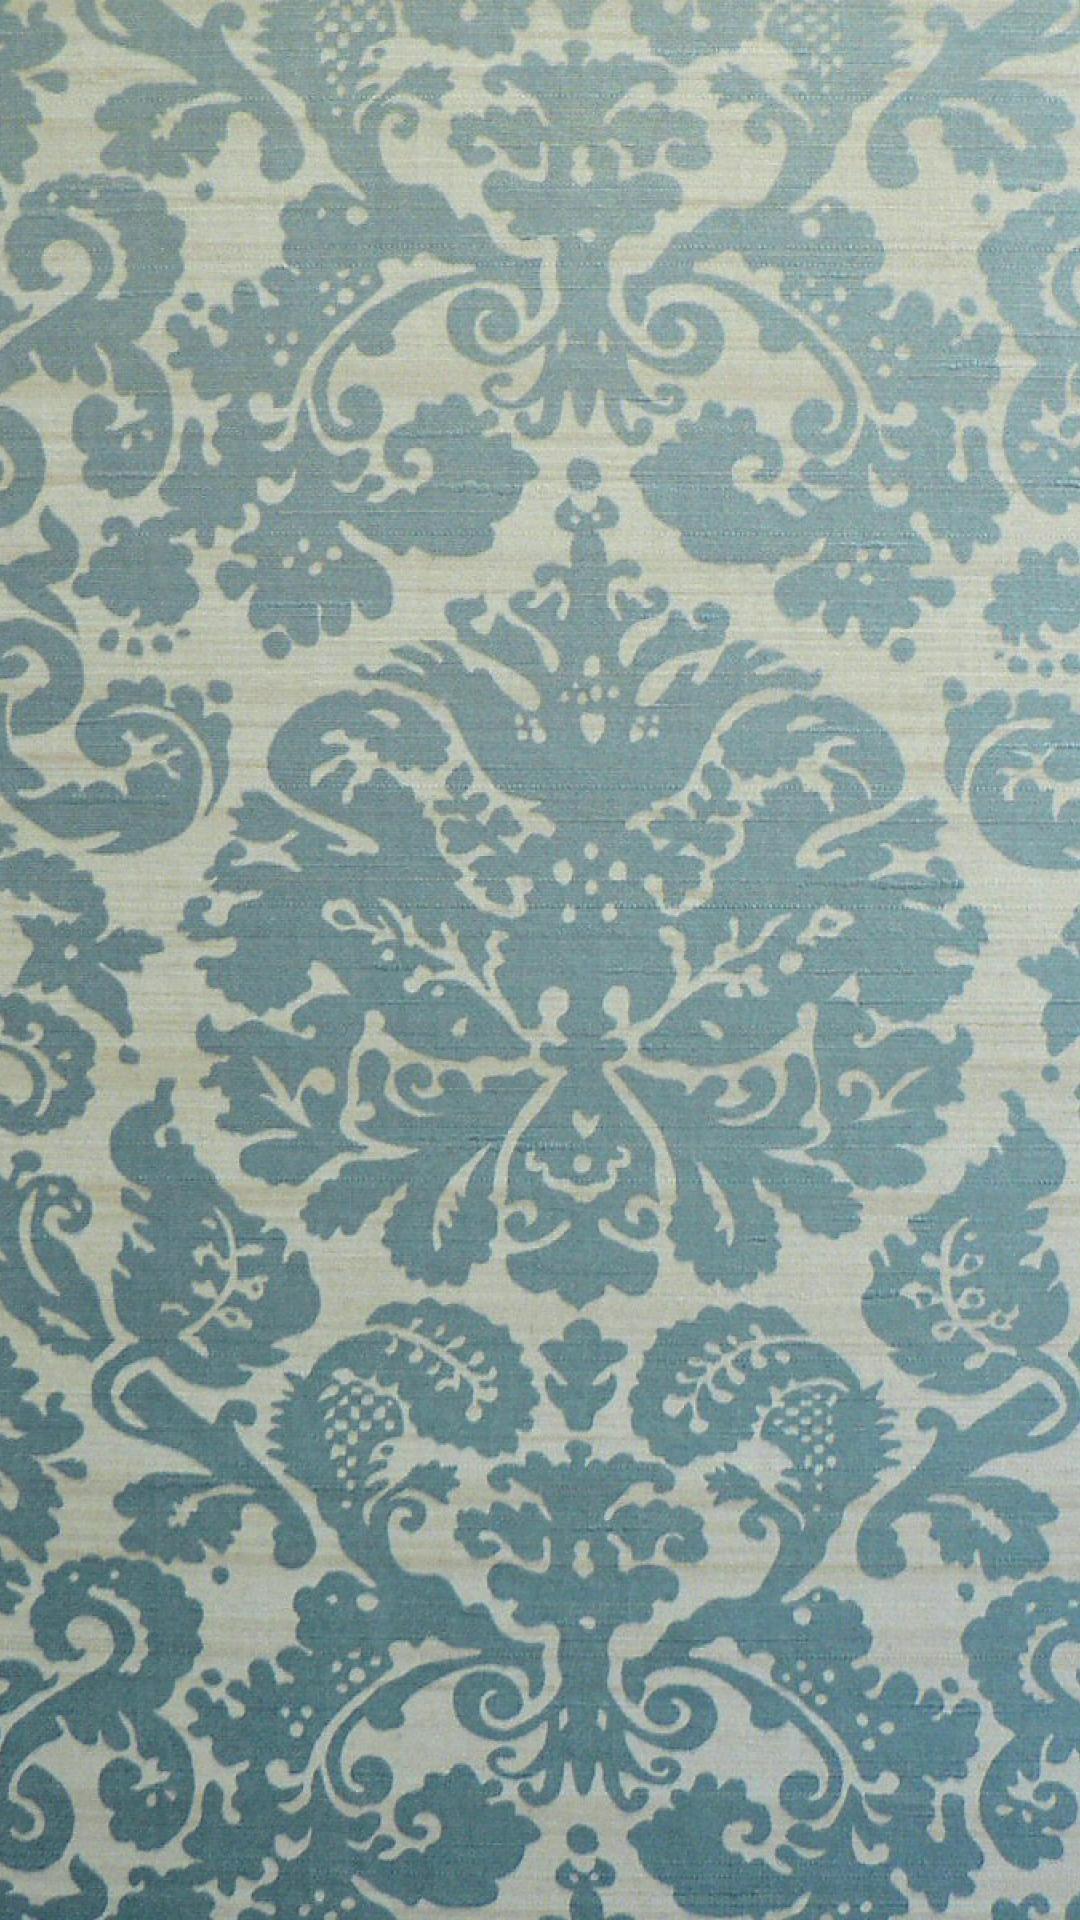 Vintage Pattern Backgrounds